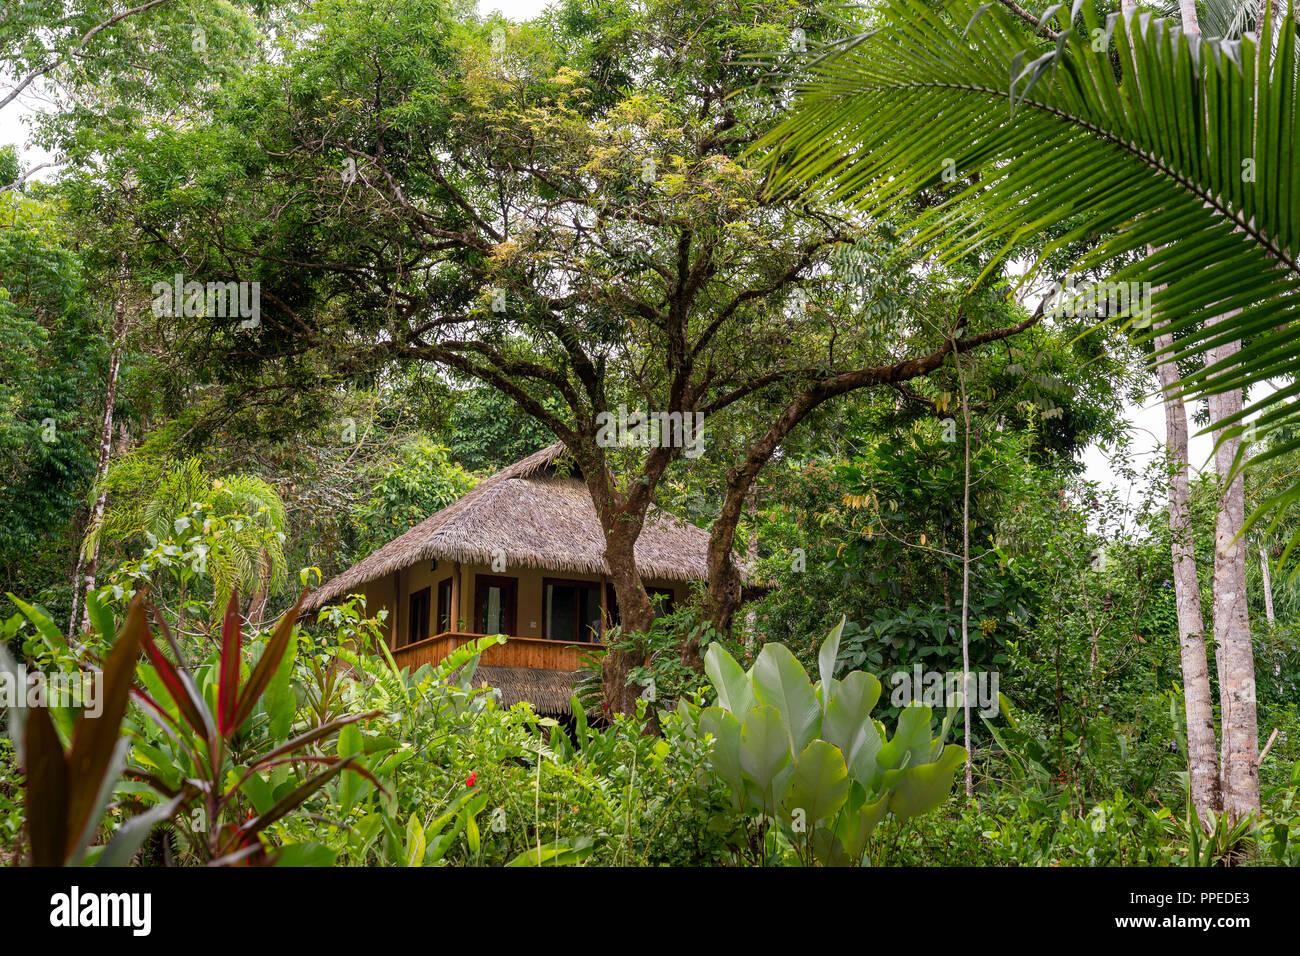 Rainforest, Corcovado National Park, Osa Peninsula, Costa Rica - Stock Image